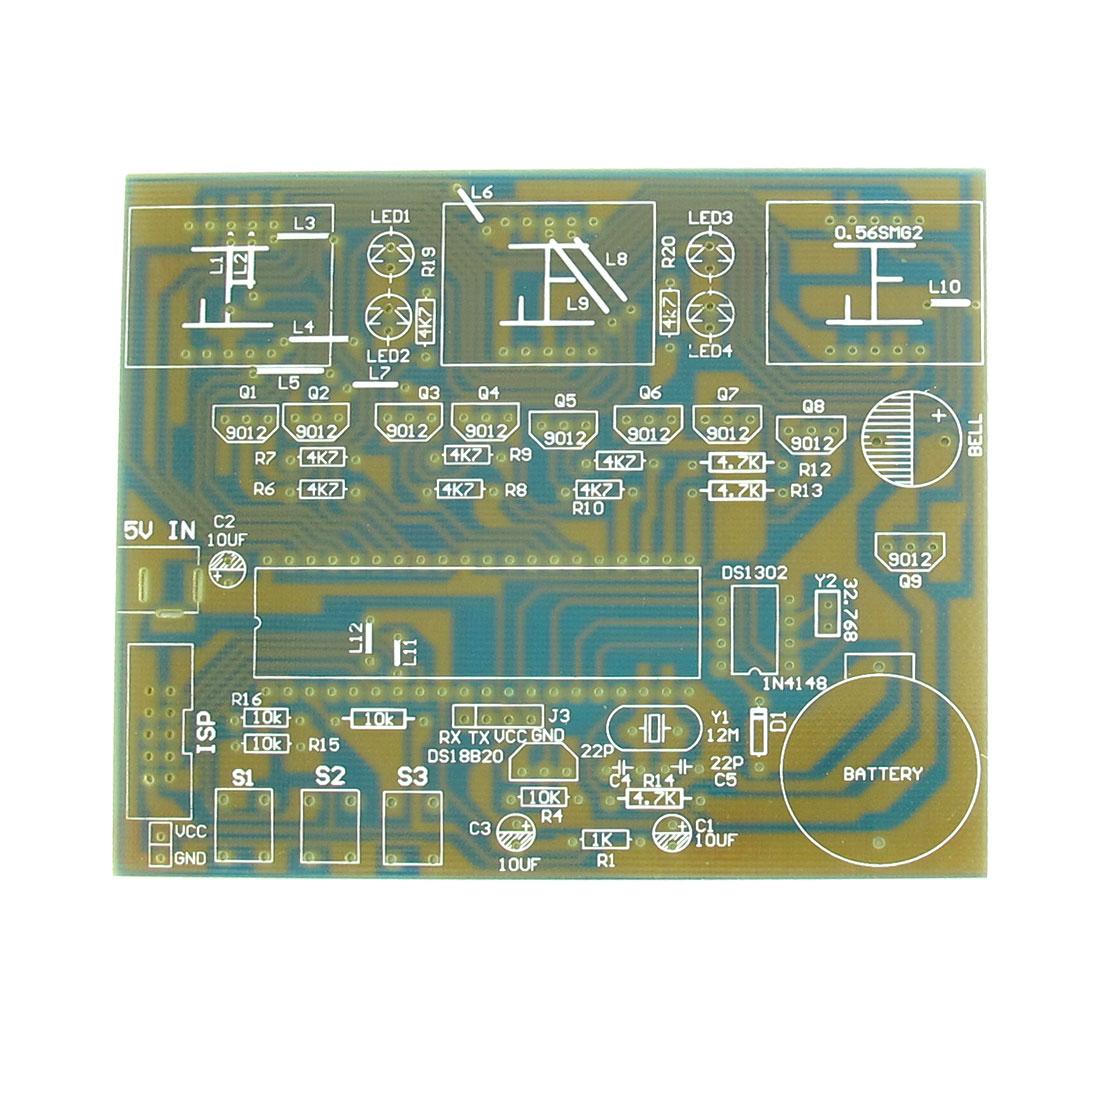 DS1302 DIY MCU Microcontroller Countdown Digital Electronic Clock Module PCB Blank Board 100mm x 83mm